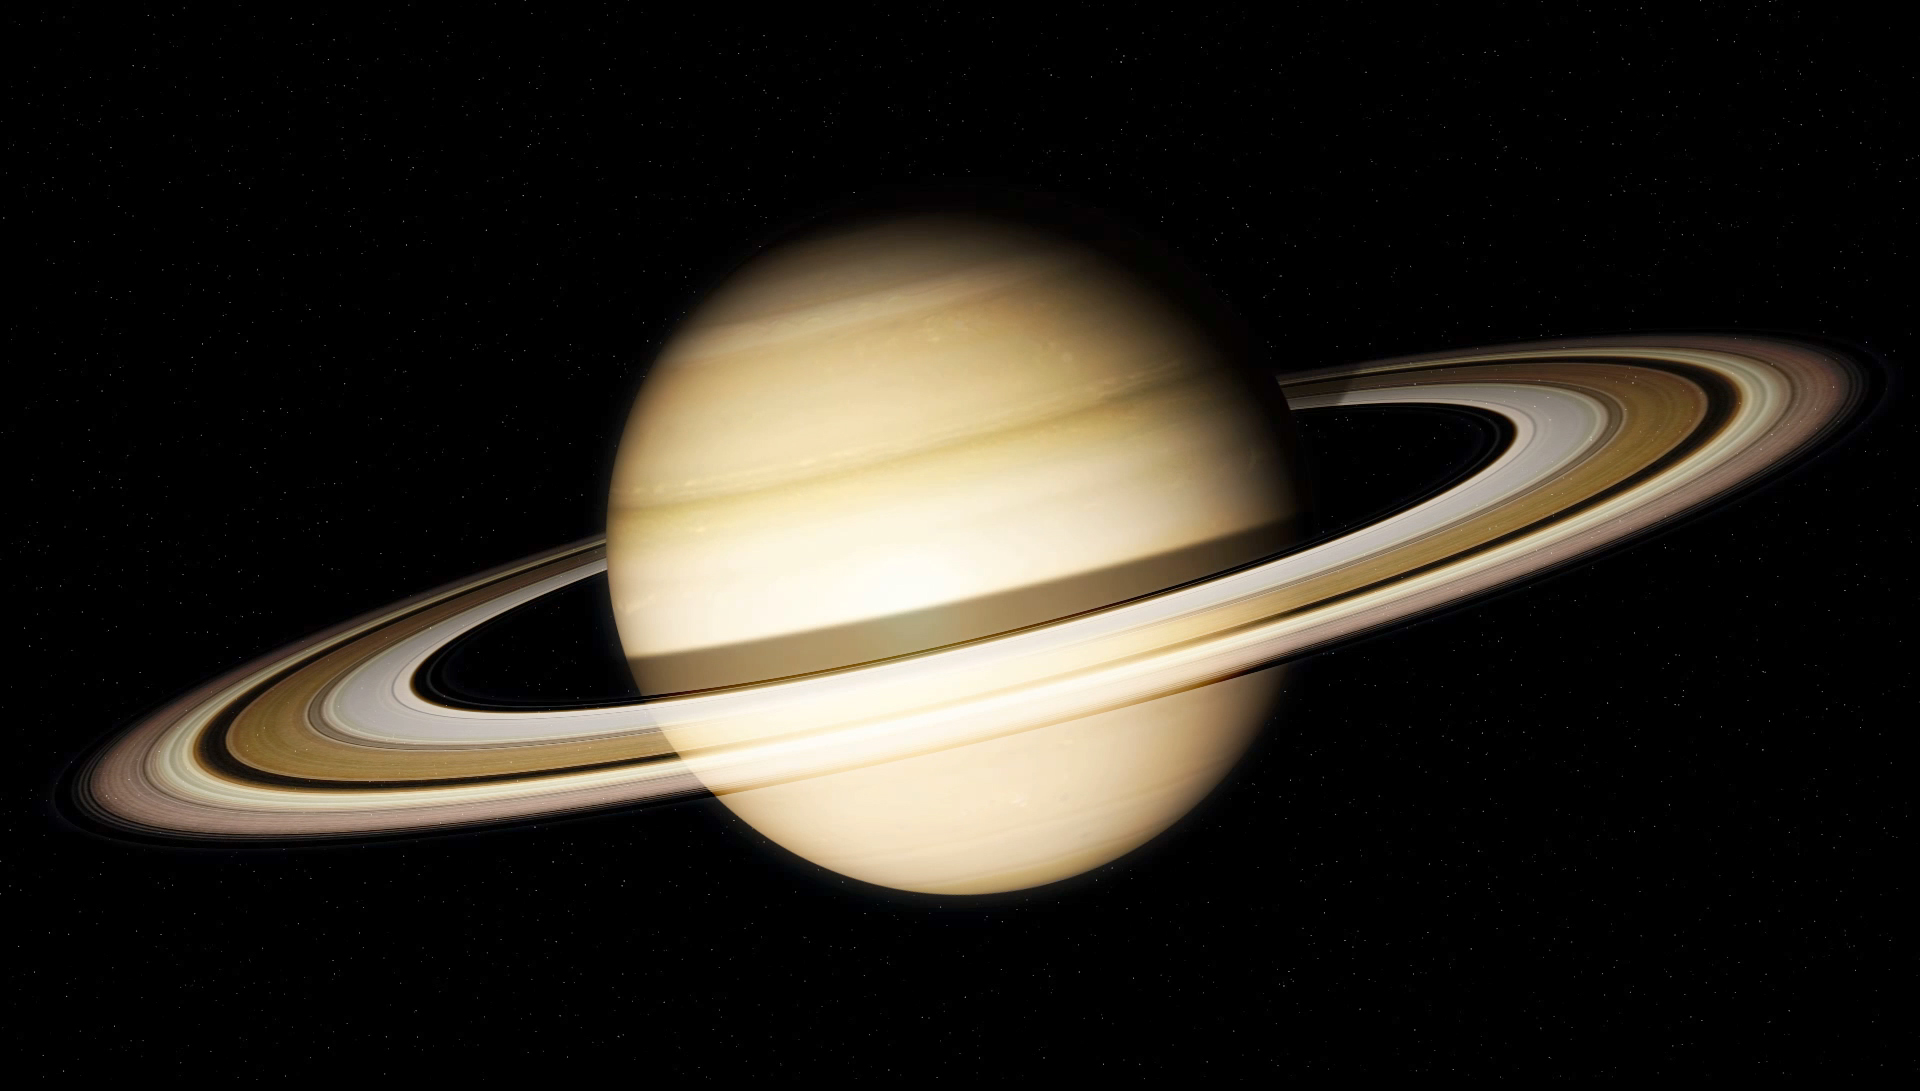 «Кассини» снял огромную тень Сатурна наего кольцах